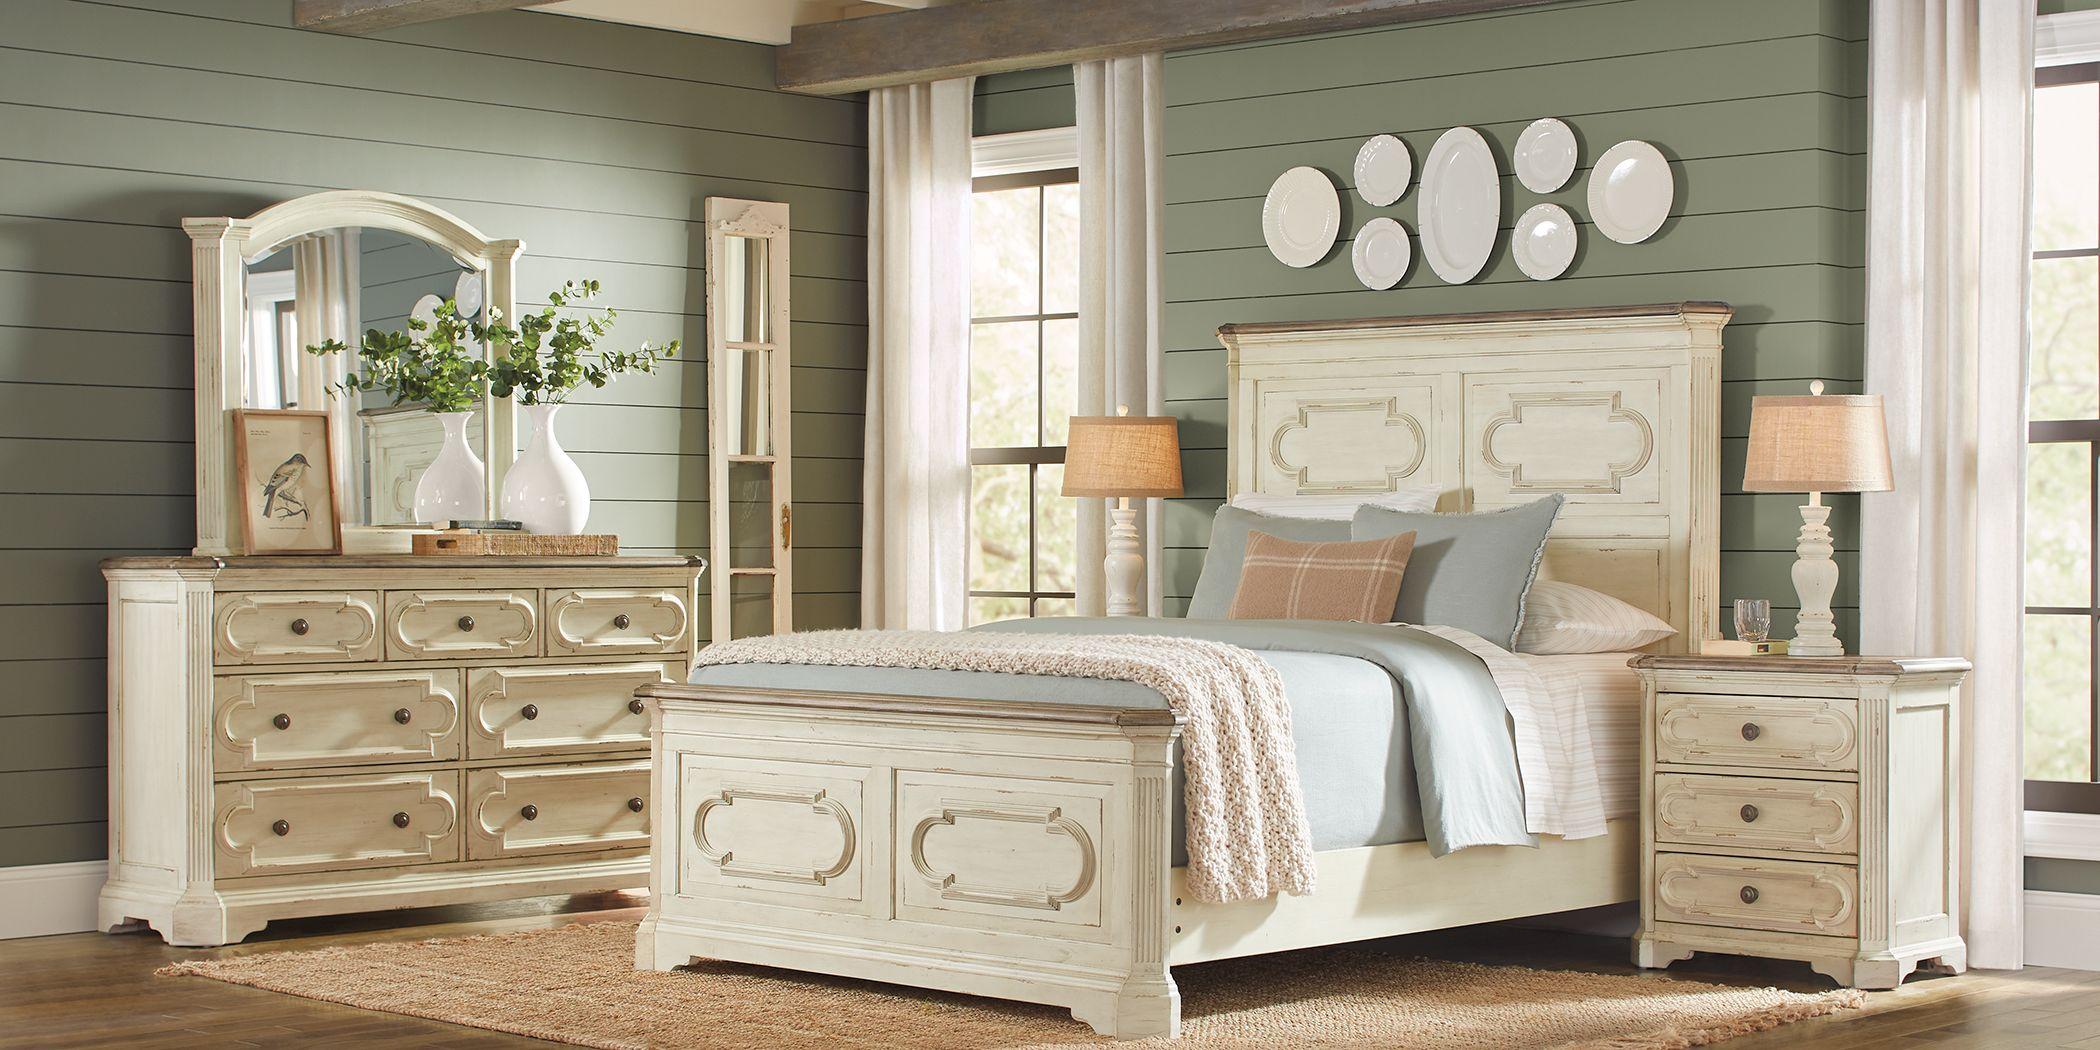 Lindenwood White 5 Pc King Panel Bedroom